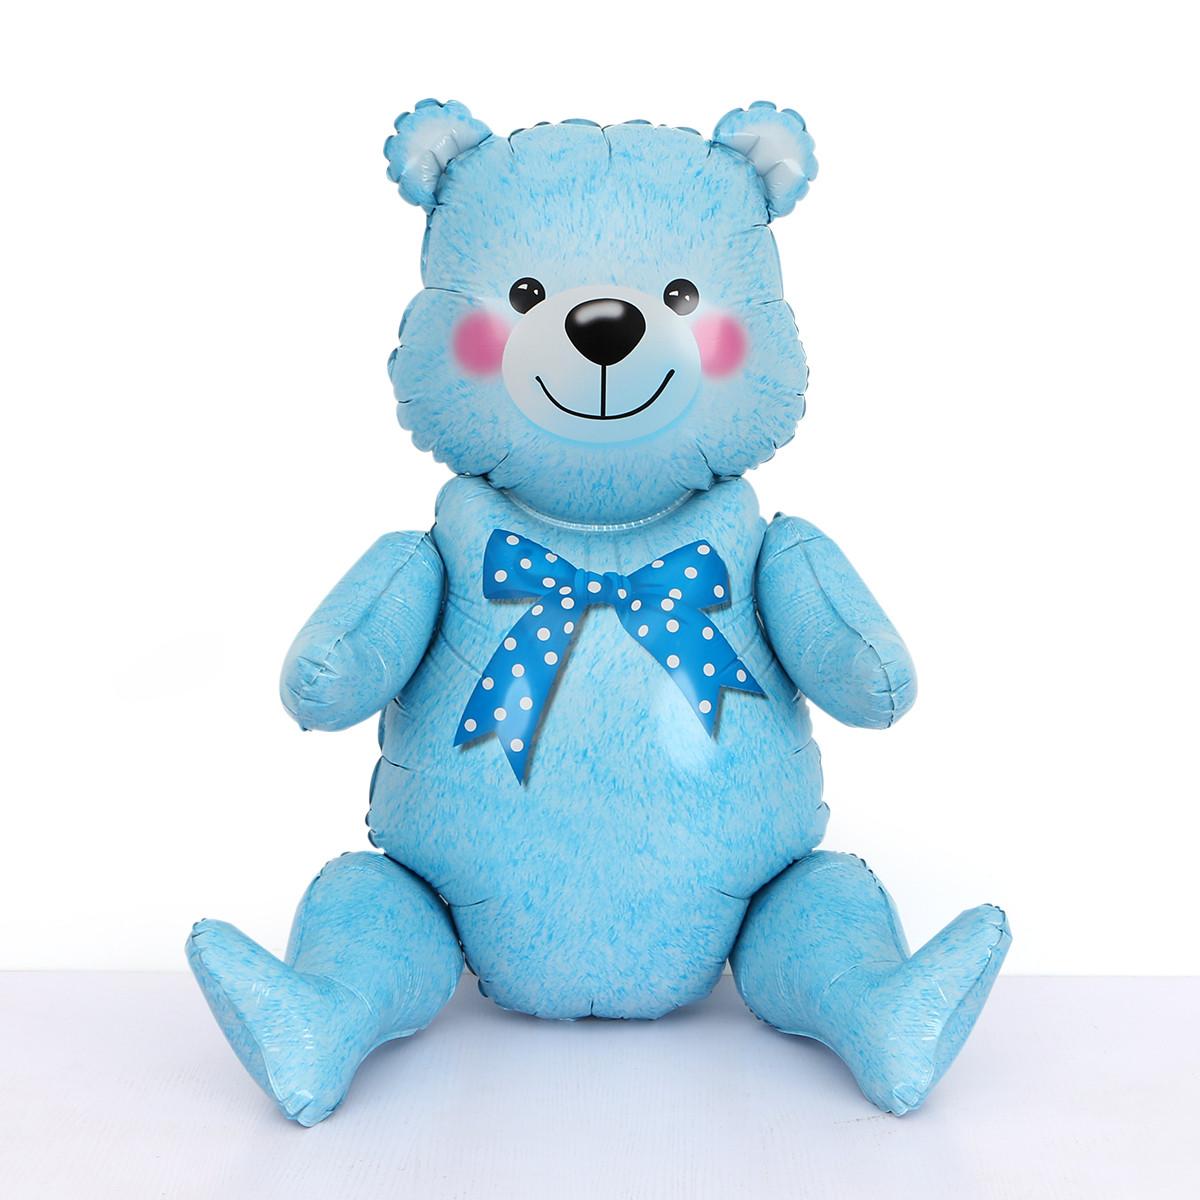 "Шар-ходячка ""Медвежонок голубой""  Размер:44см*81.5см."